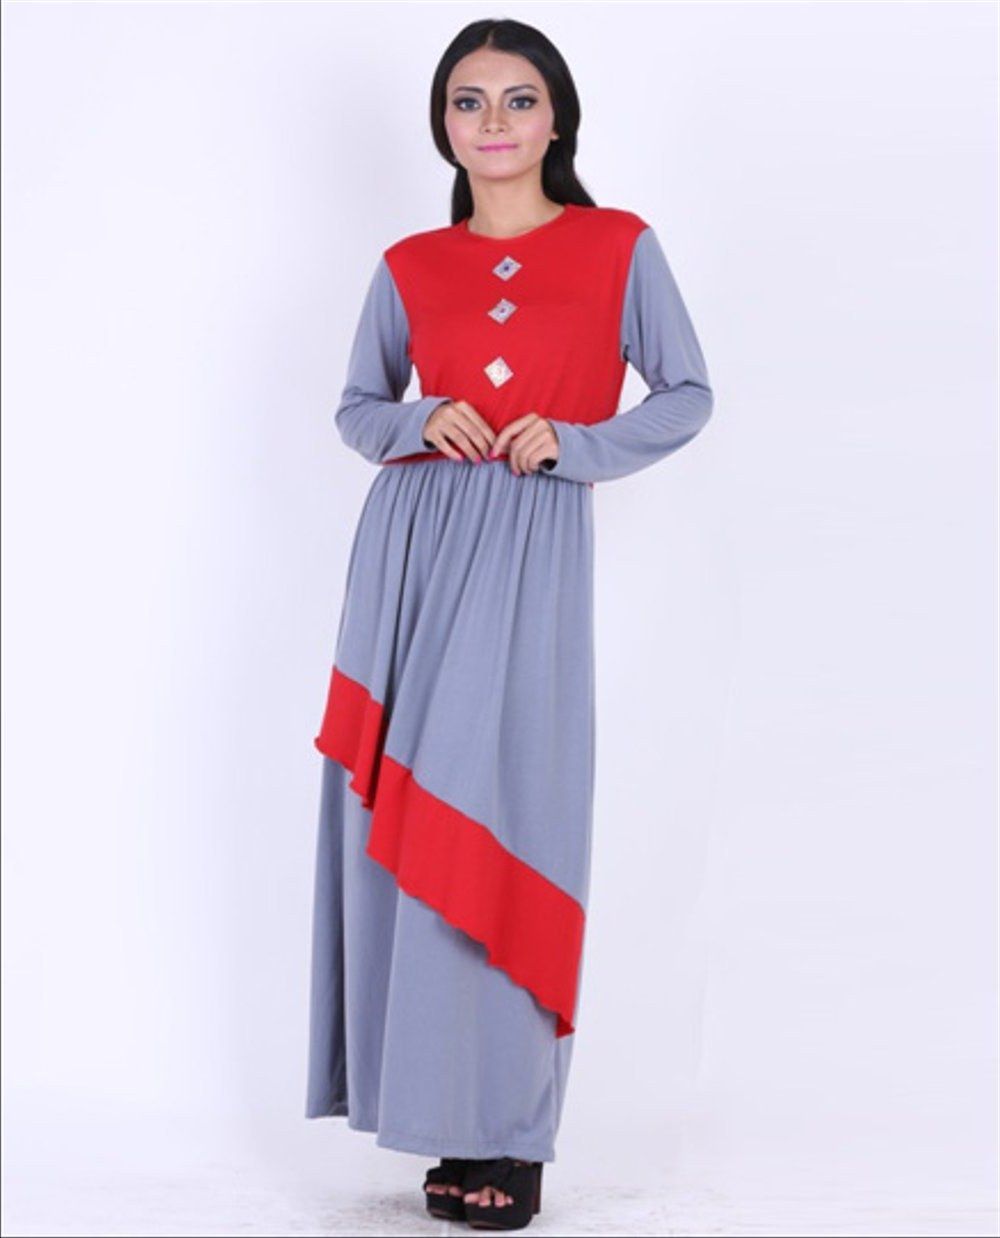 Bentuk Fashion Muslim Korea Whdr Jual Model Baju Dress Wanita Murah Korea Muslim Long Dress